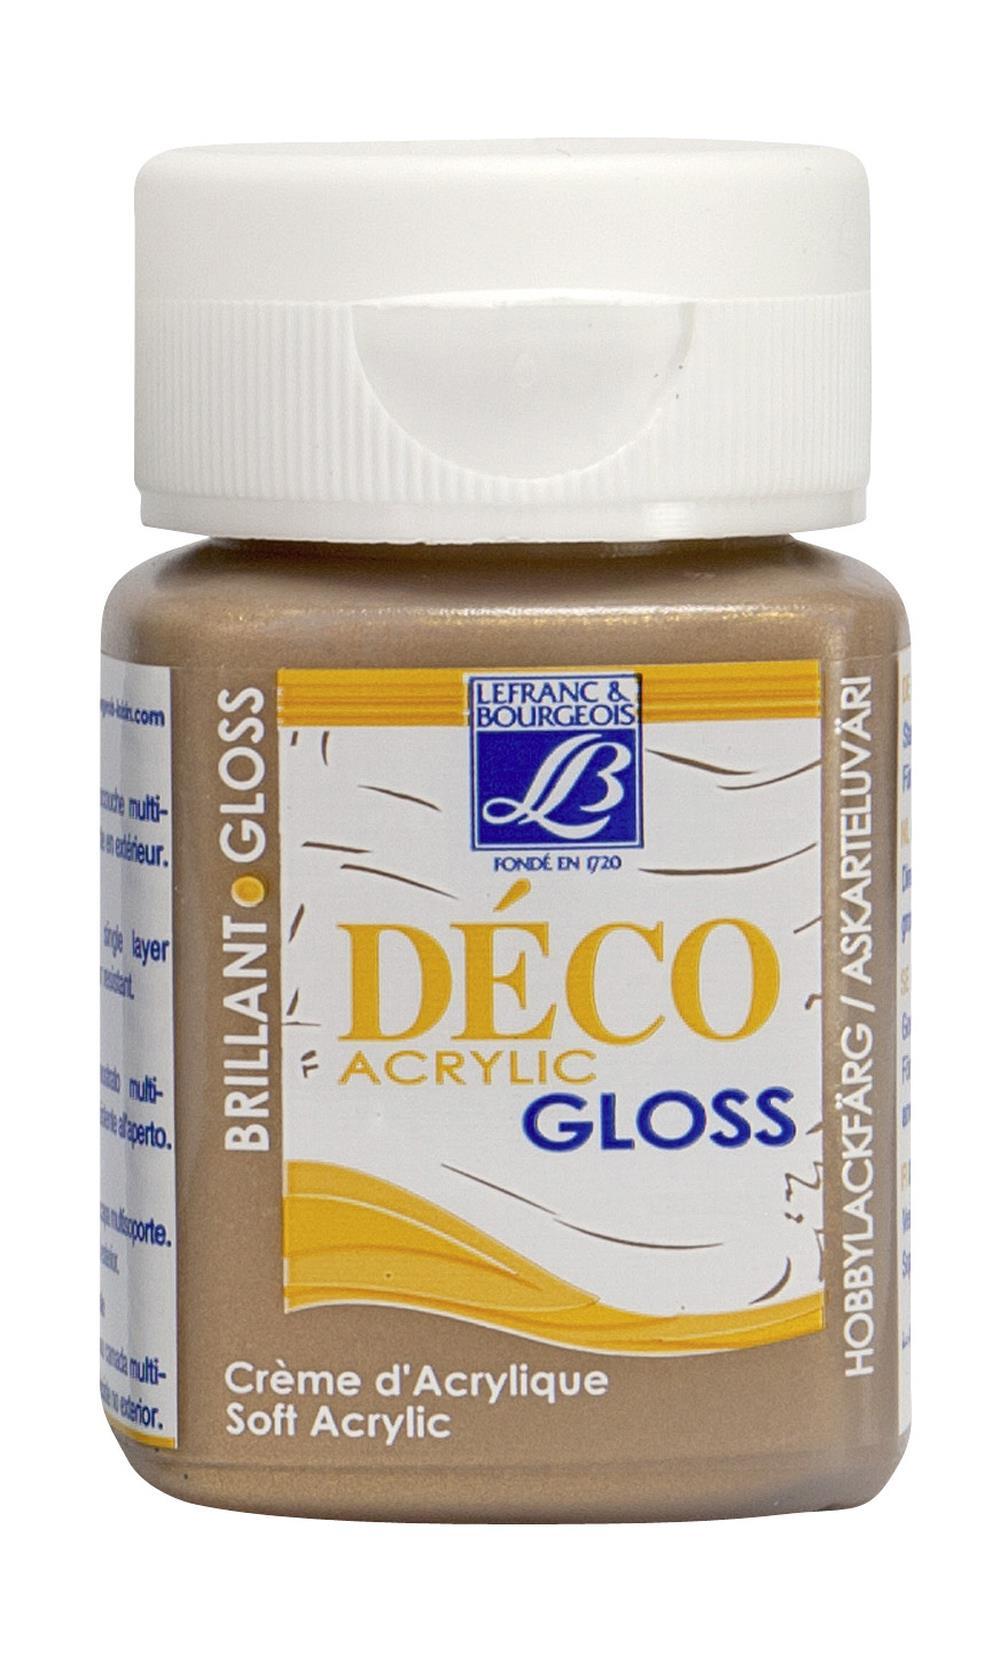 Hobbyfärg L&B Deco Gloss Akryl 50ml Old gold 704 (4F) Utgår